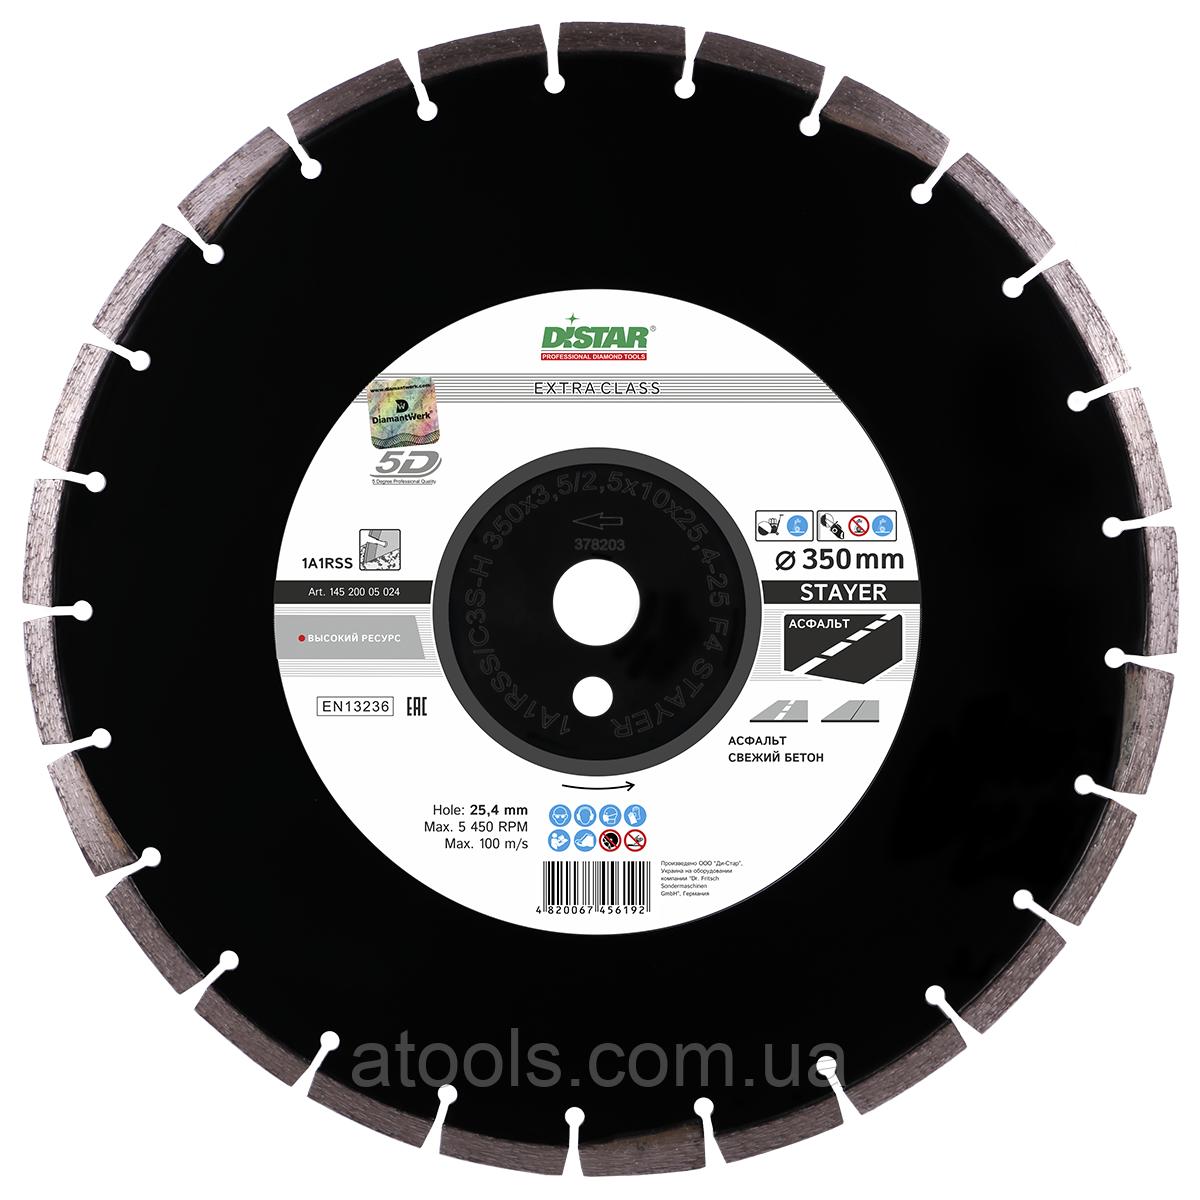 Алмазный отрезной диск Distar 1A1RSS/C3S 400x3.5/2.5x10x25.4-11.5-28/7 HIT STAYER (14520005026)